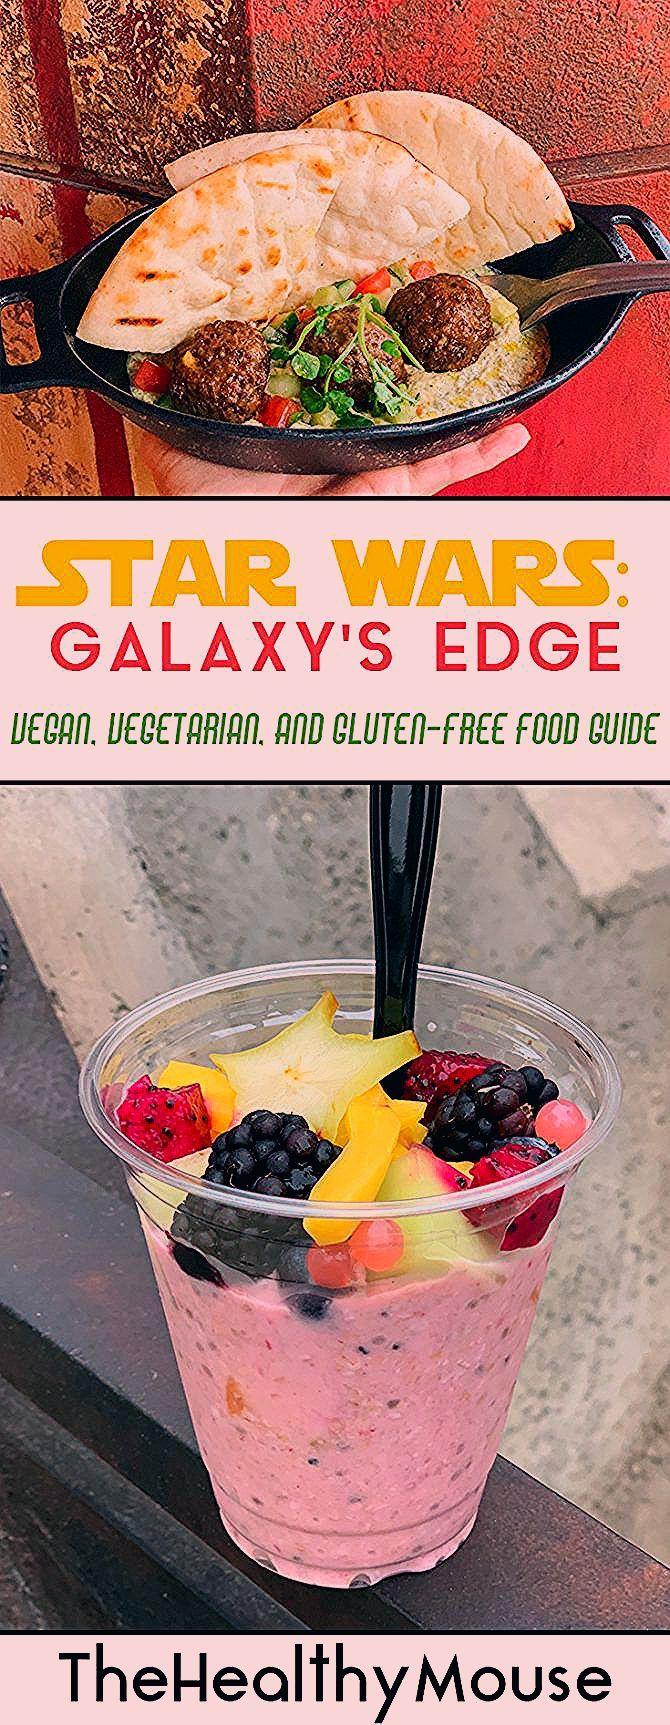 Star Wars: Galaxy's Edge Vegan, Vegetarian, and Gluten-Free Food Guide